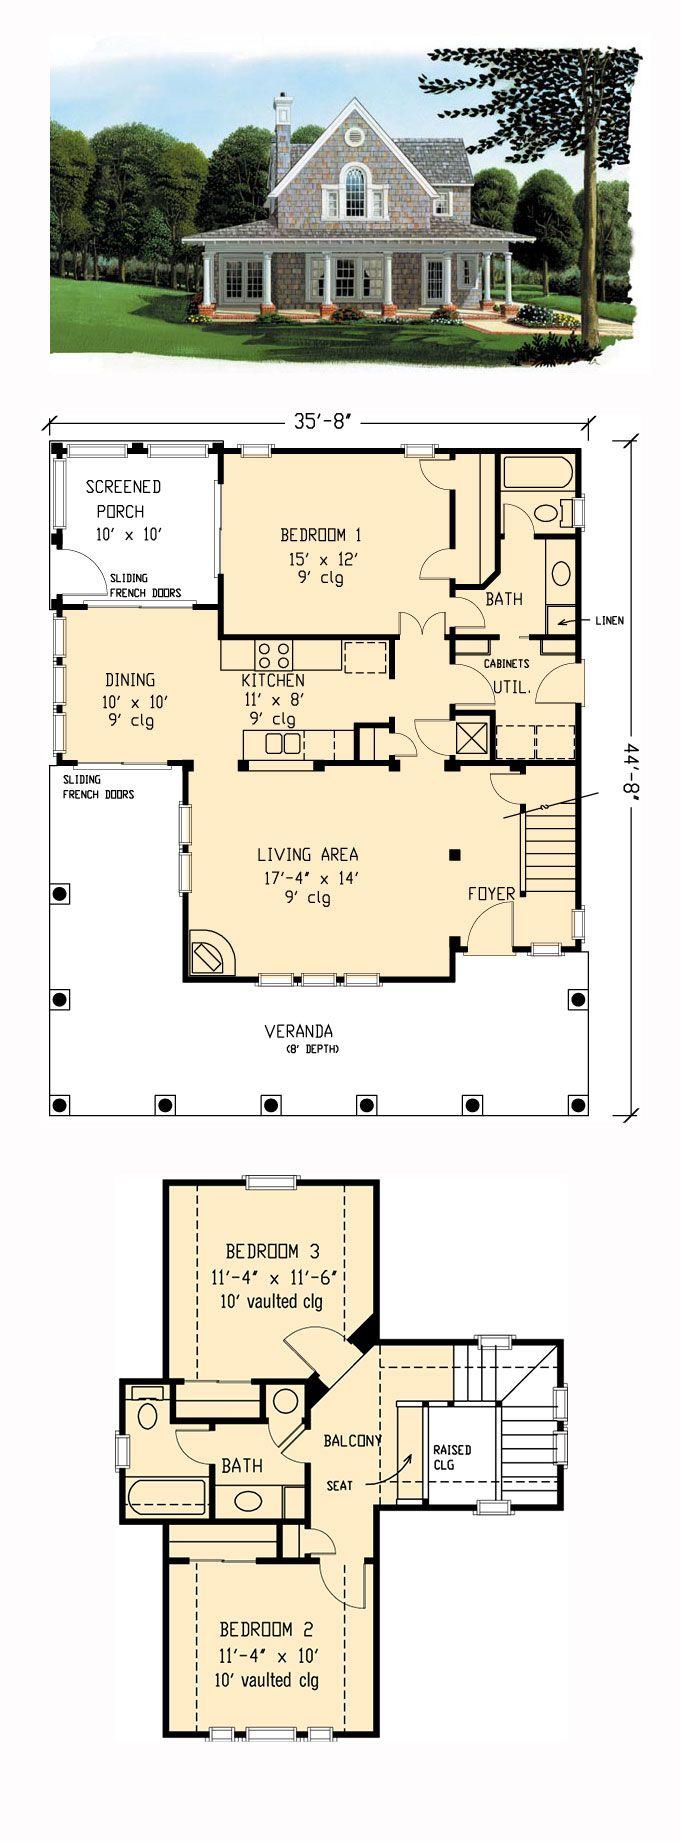 Cool House Floor Plans 25+ best cool house plans ideas on pinterest   house layout plans